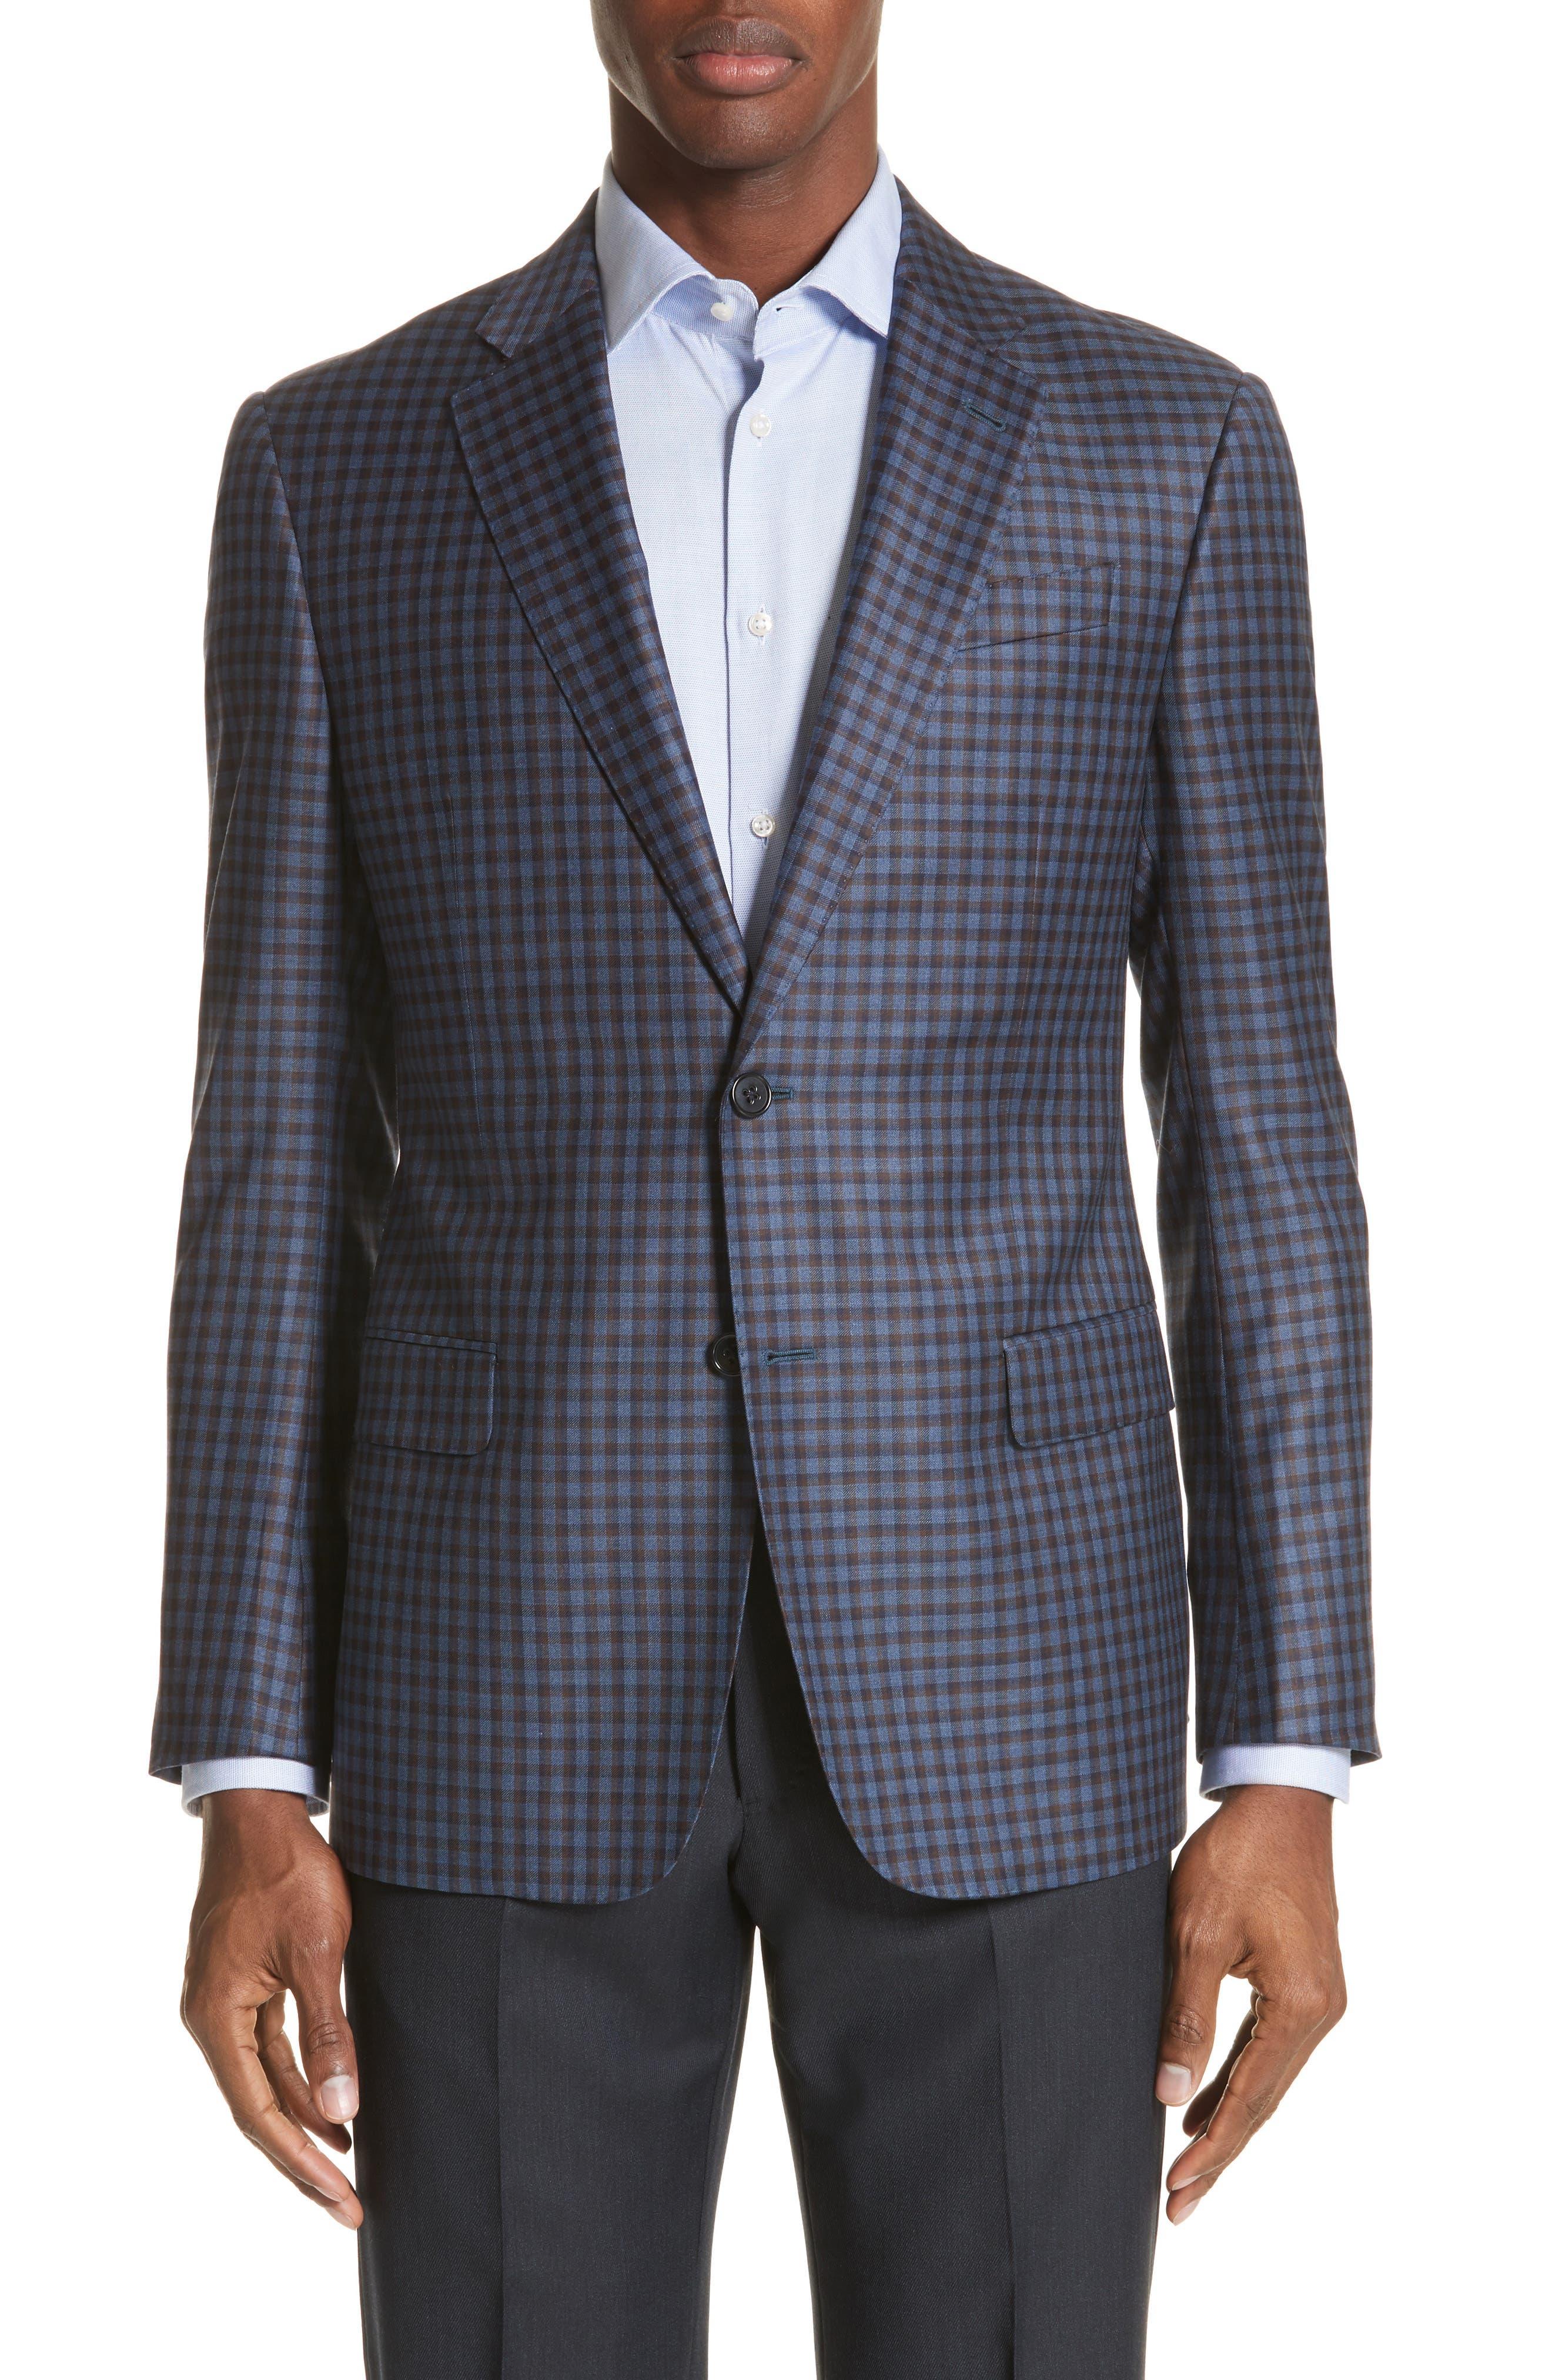 Main Image - Emporio Armani G Line Trim Fit Check Wool Sport Coat